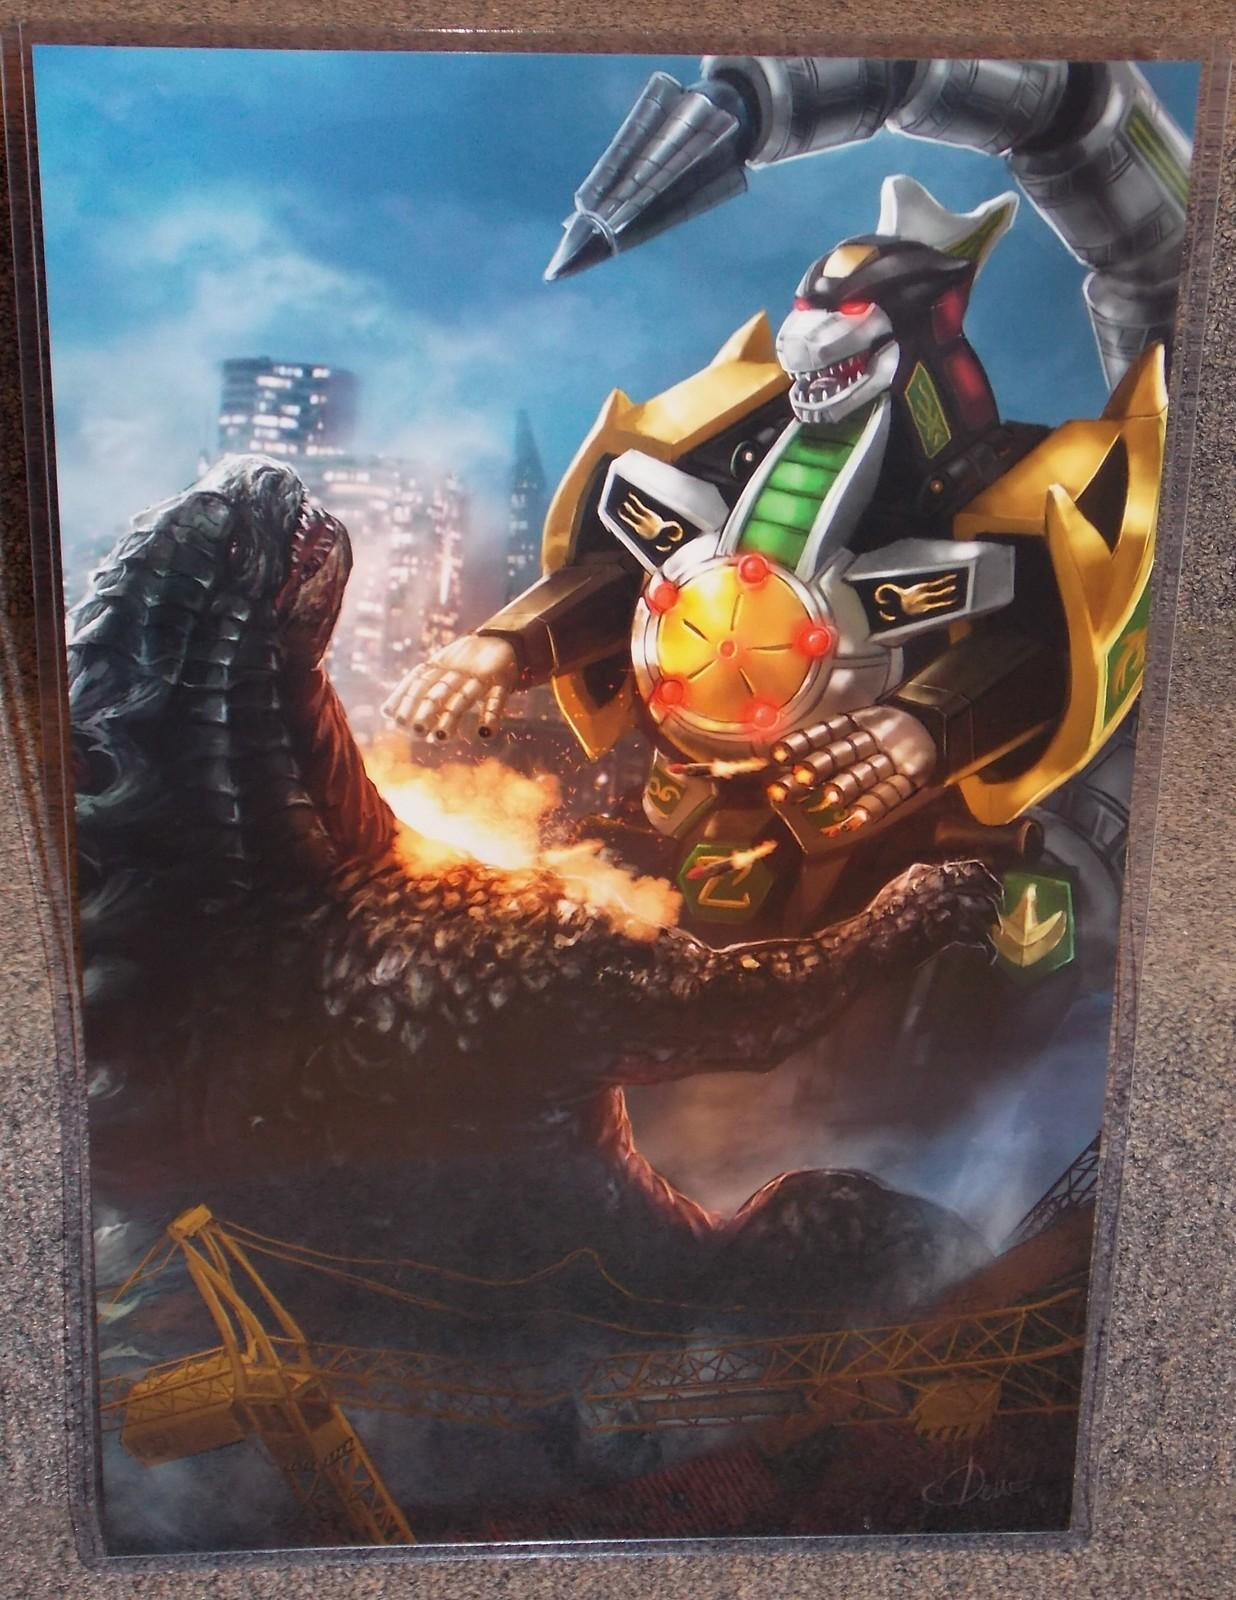 Godzilla vs Power Rangers Dragonzord Glossy Print 11 x 17 In Hard Plastic Sleeve